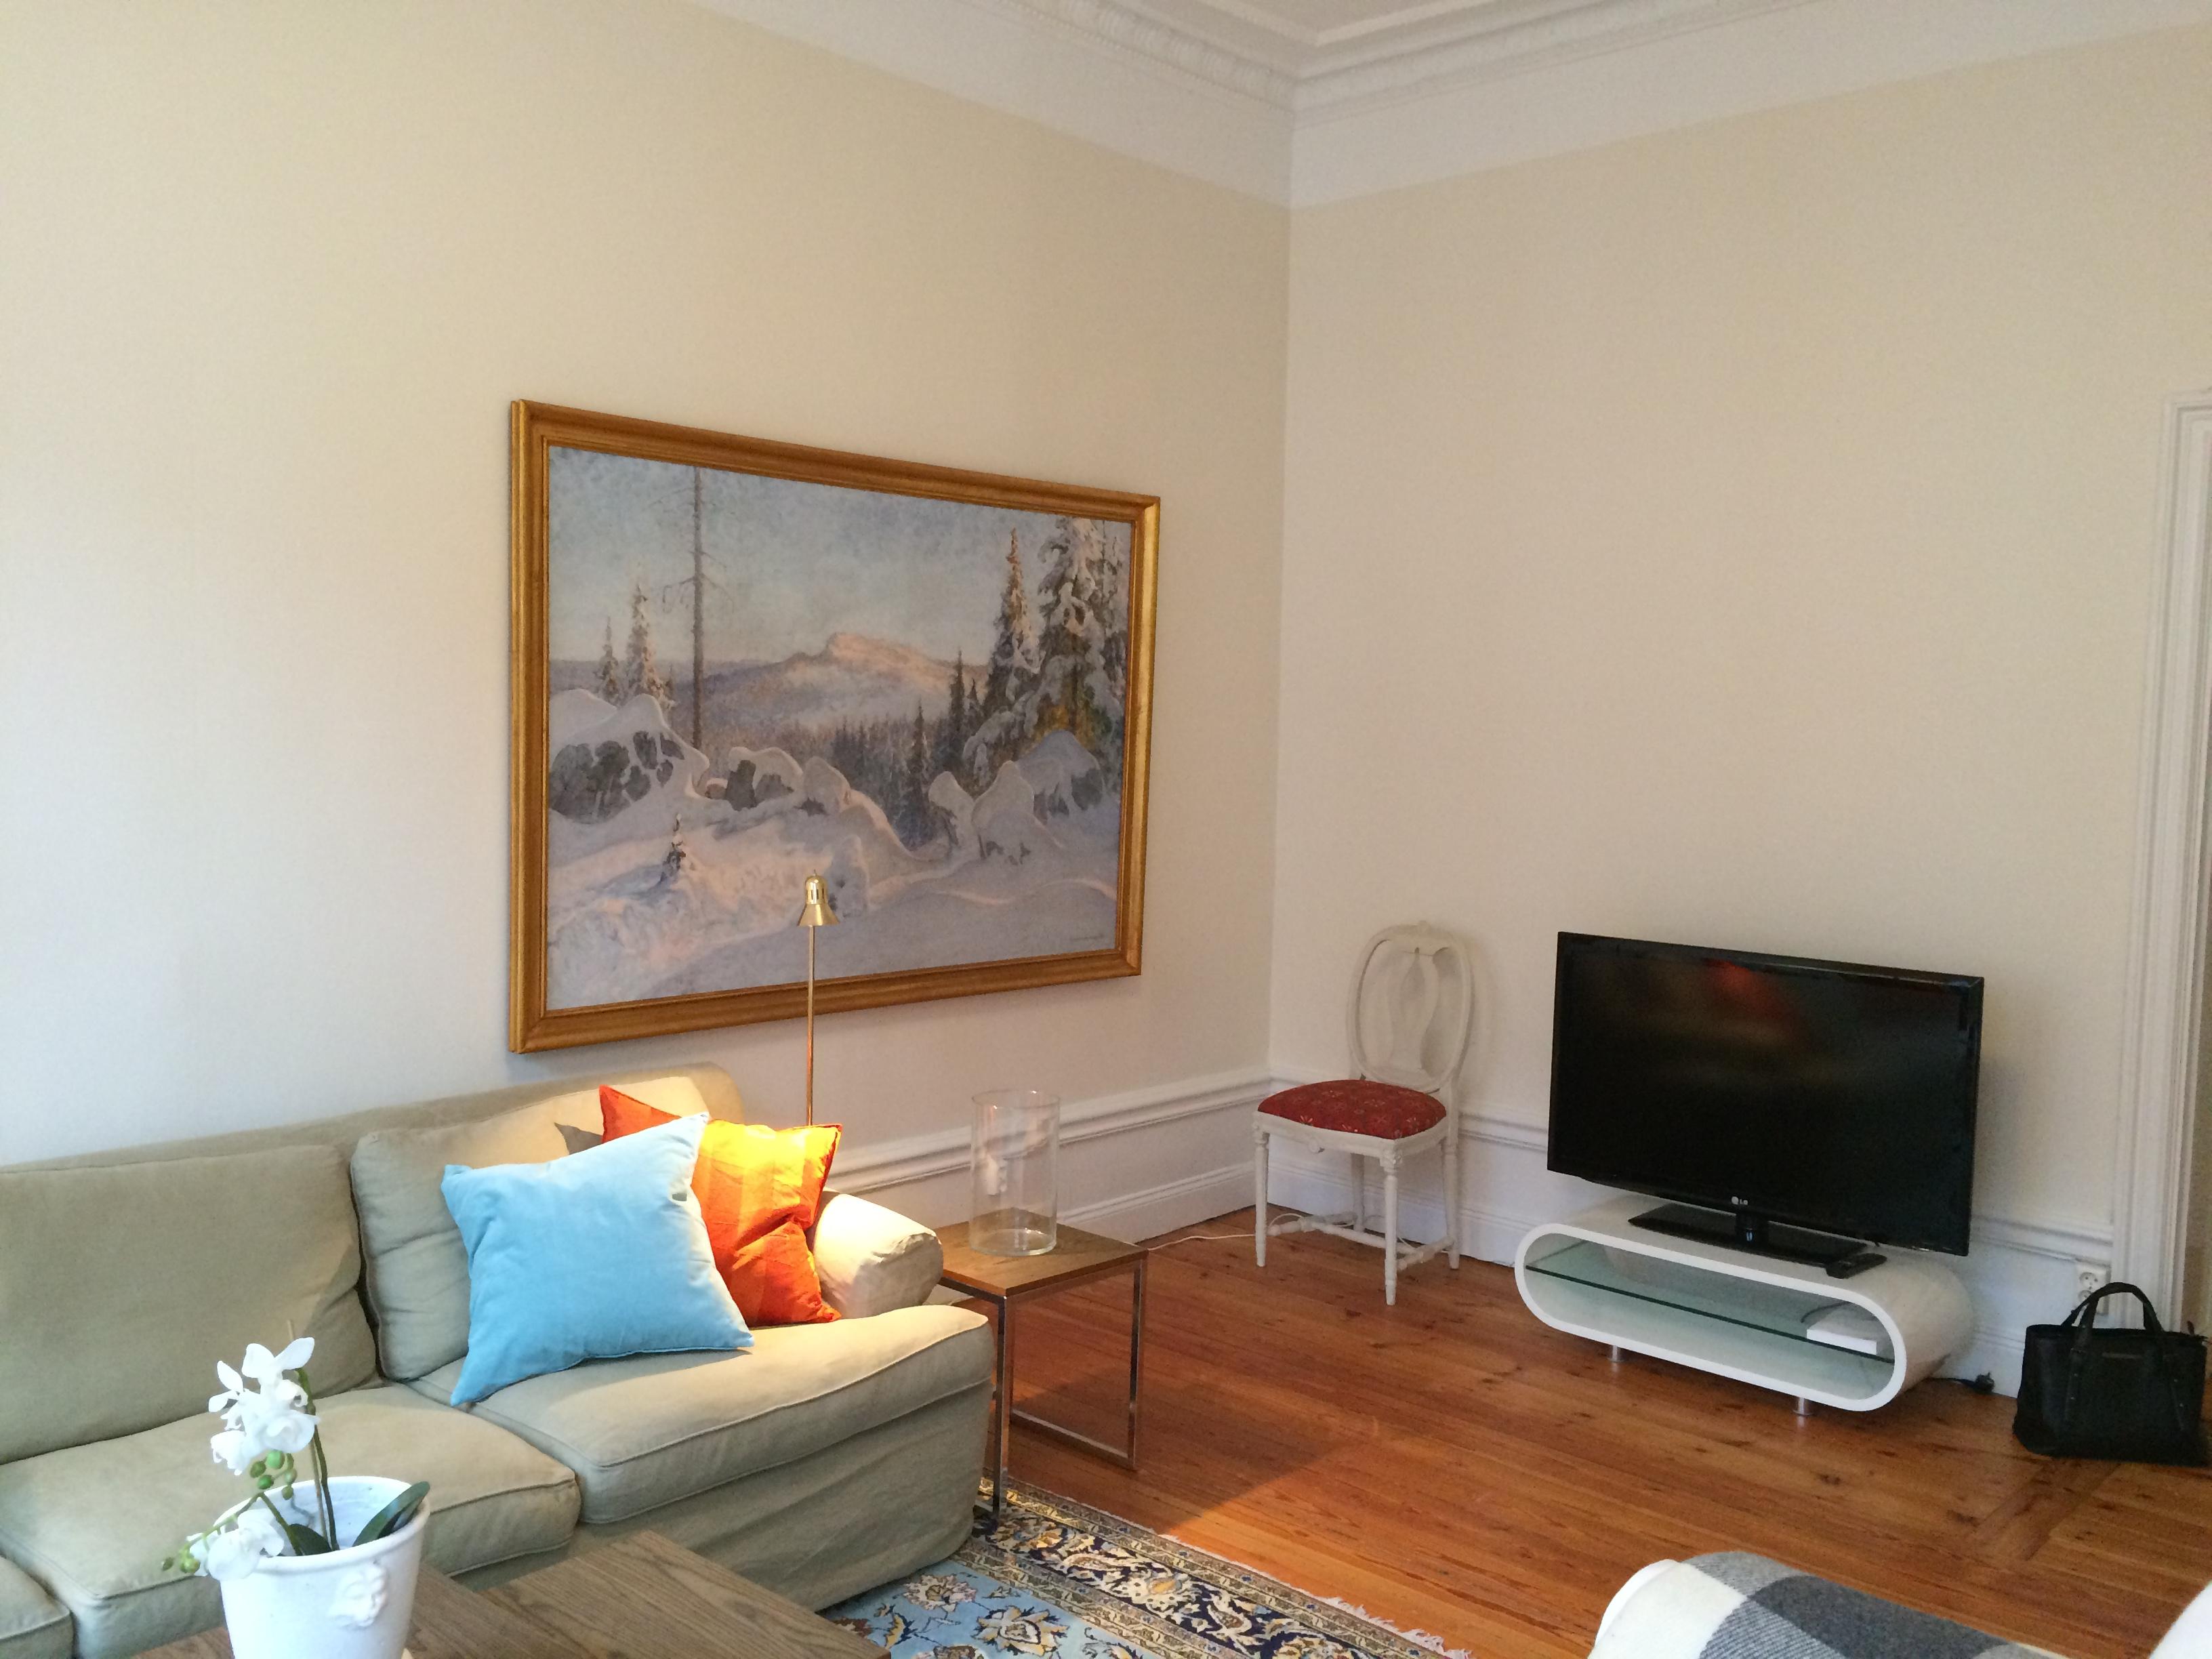 Corporate apartments rent Newstay, Skeppargatan 2, Östermalm